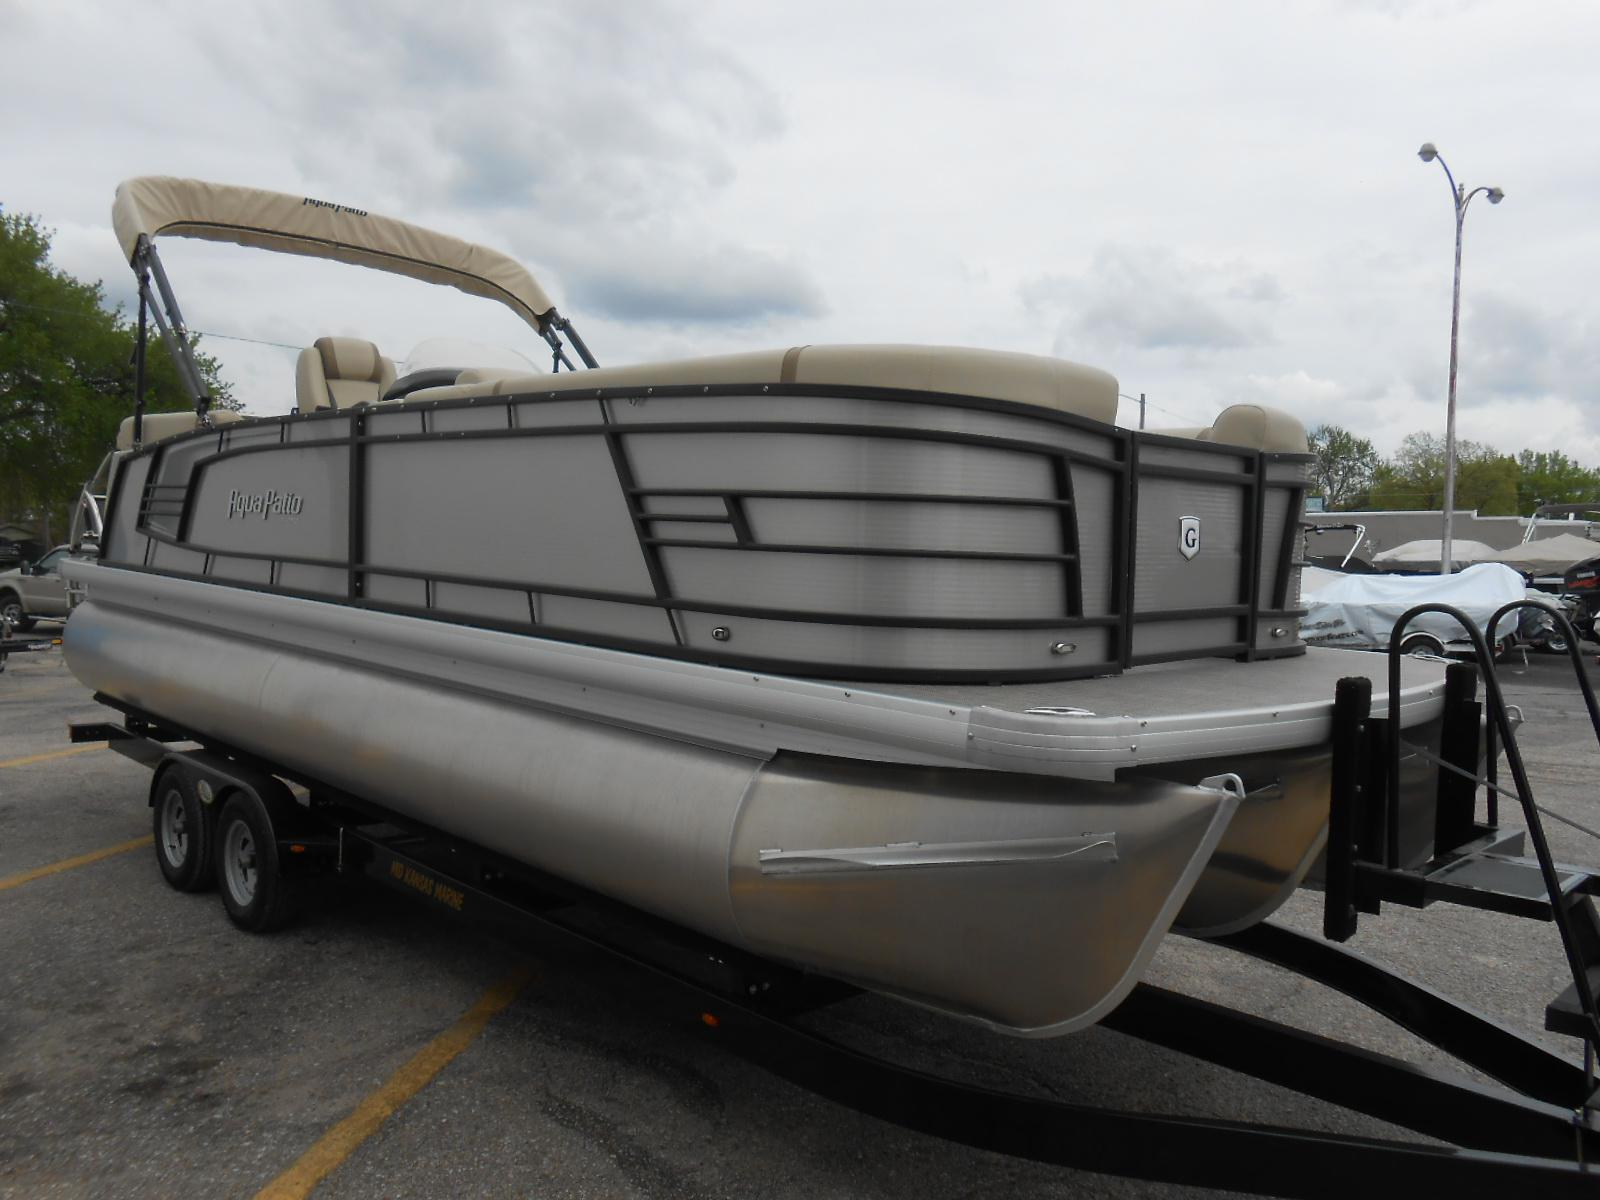 2017 Aqua Patio 255 UL for sale in Andover KS Mid Kansas Marine